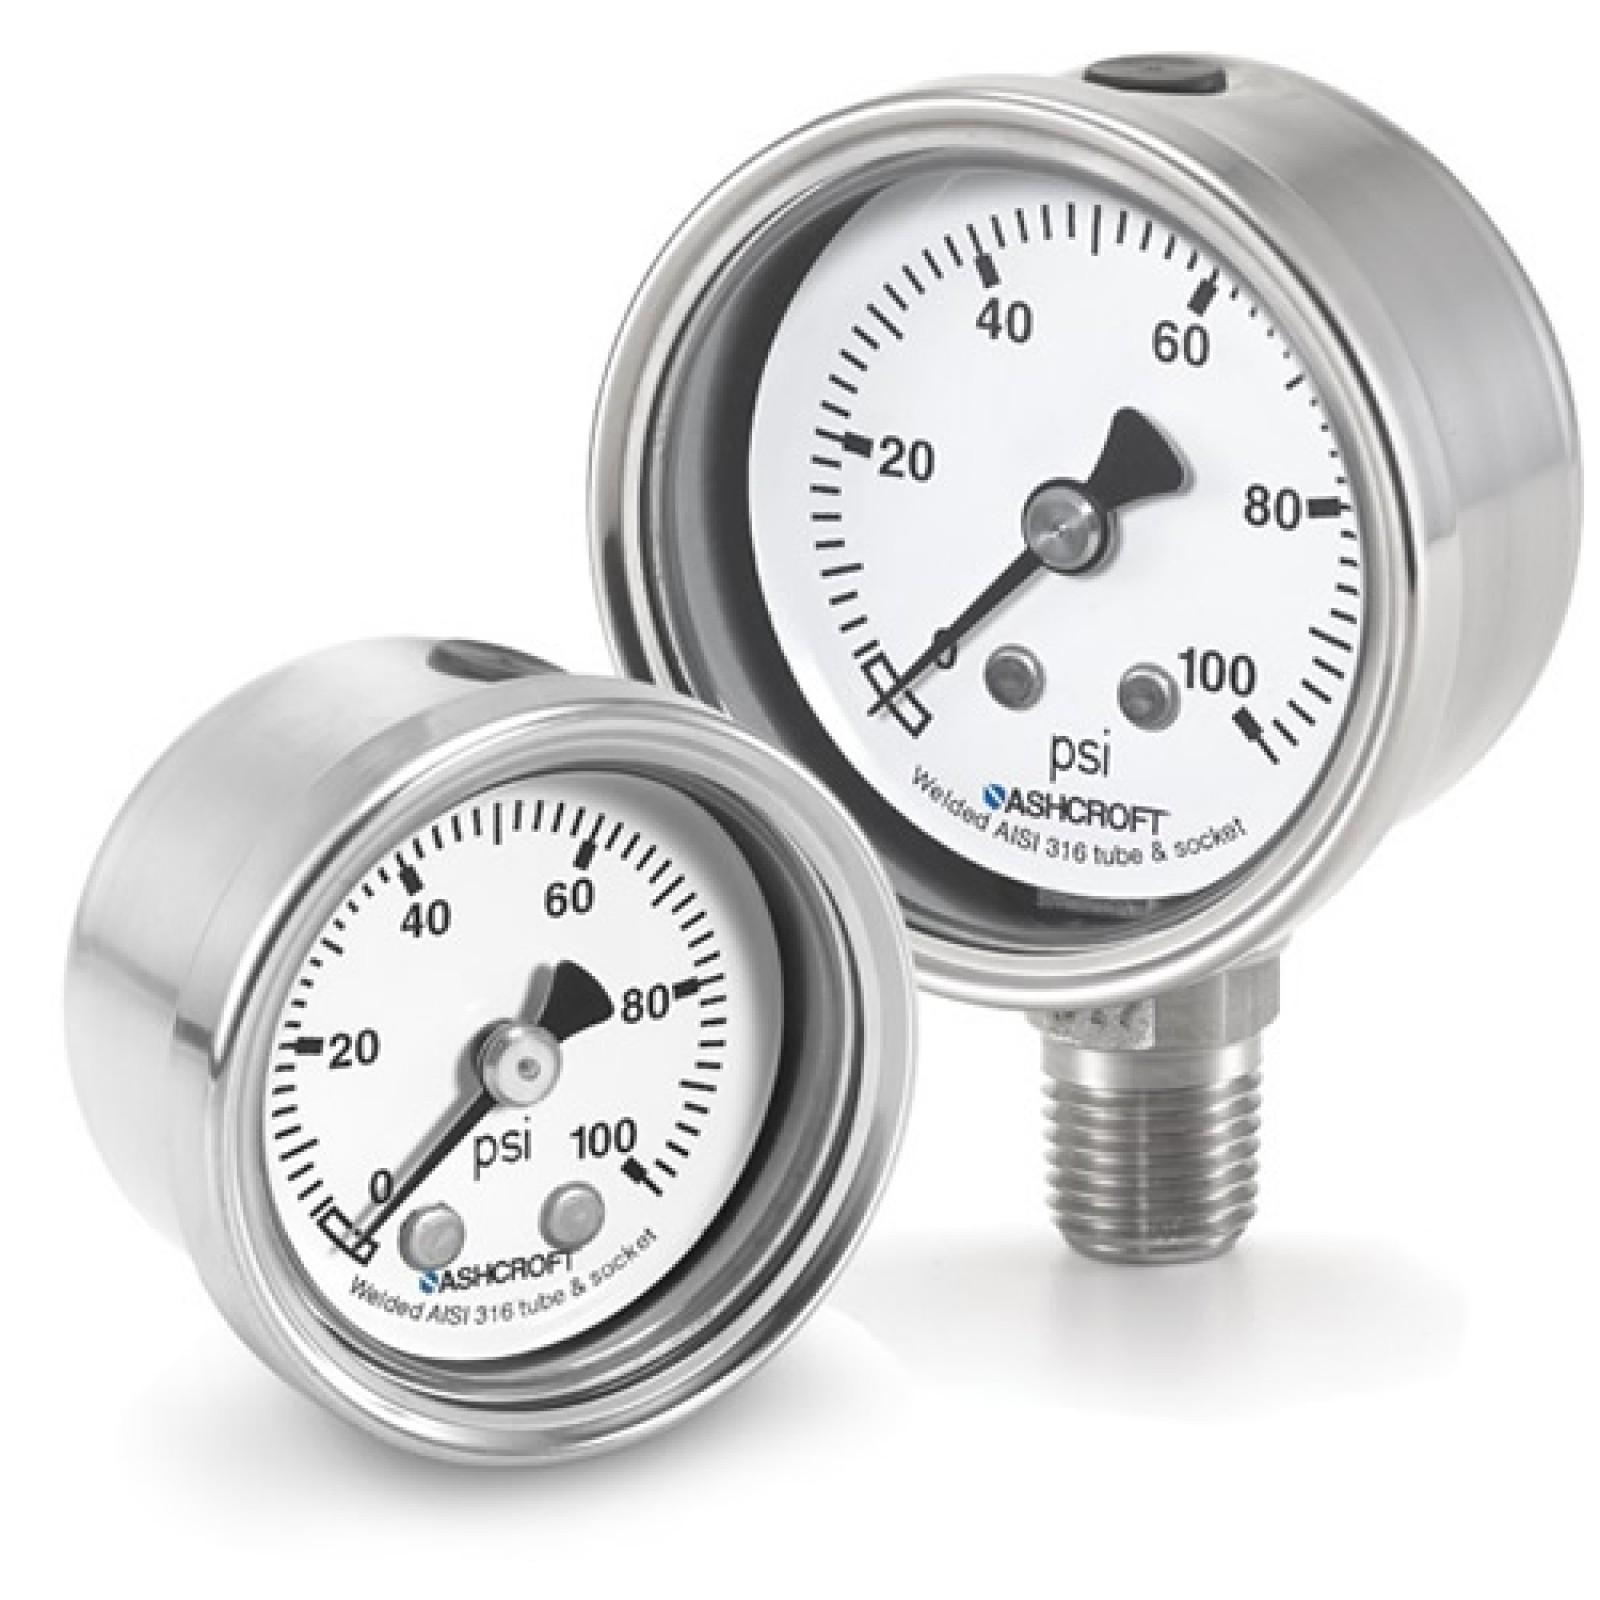 "63 1008S 02L 160#/KP - Pressure Gauge, 63mm stainless 1/4"" NPT Lower conn & Case, 0/160 psi"